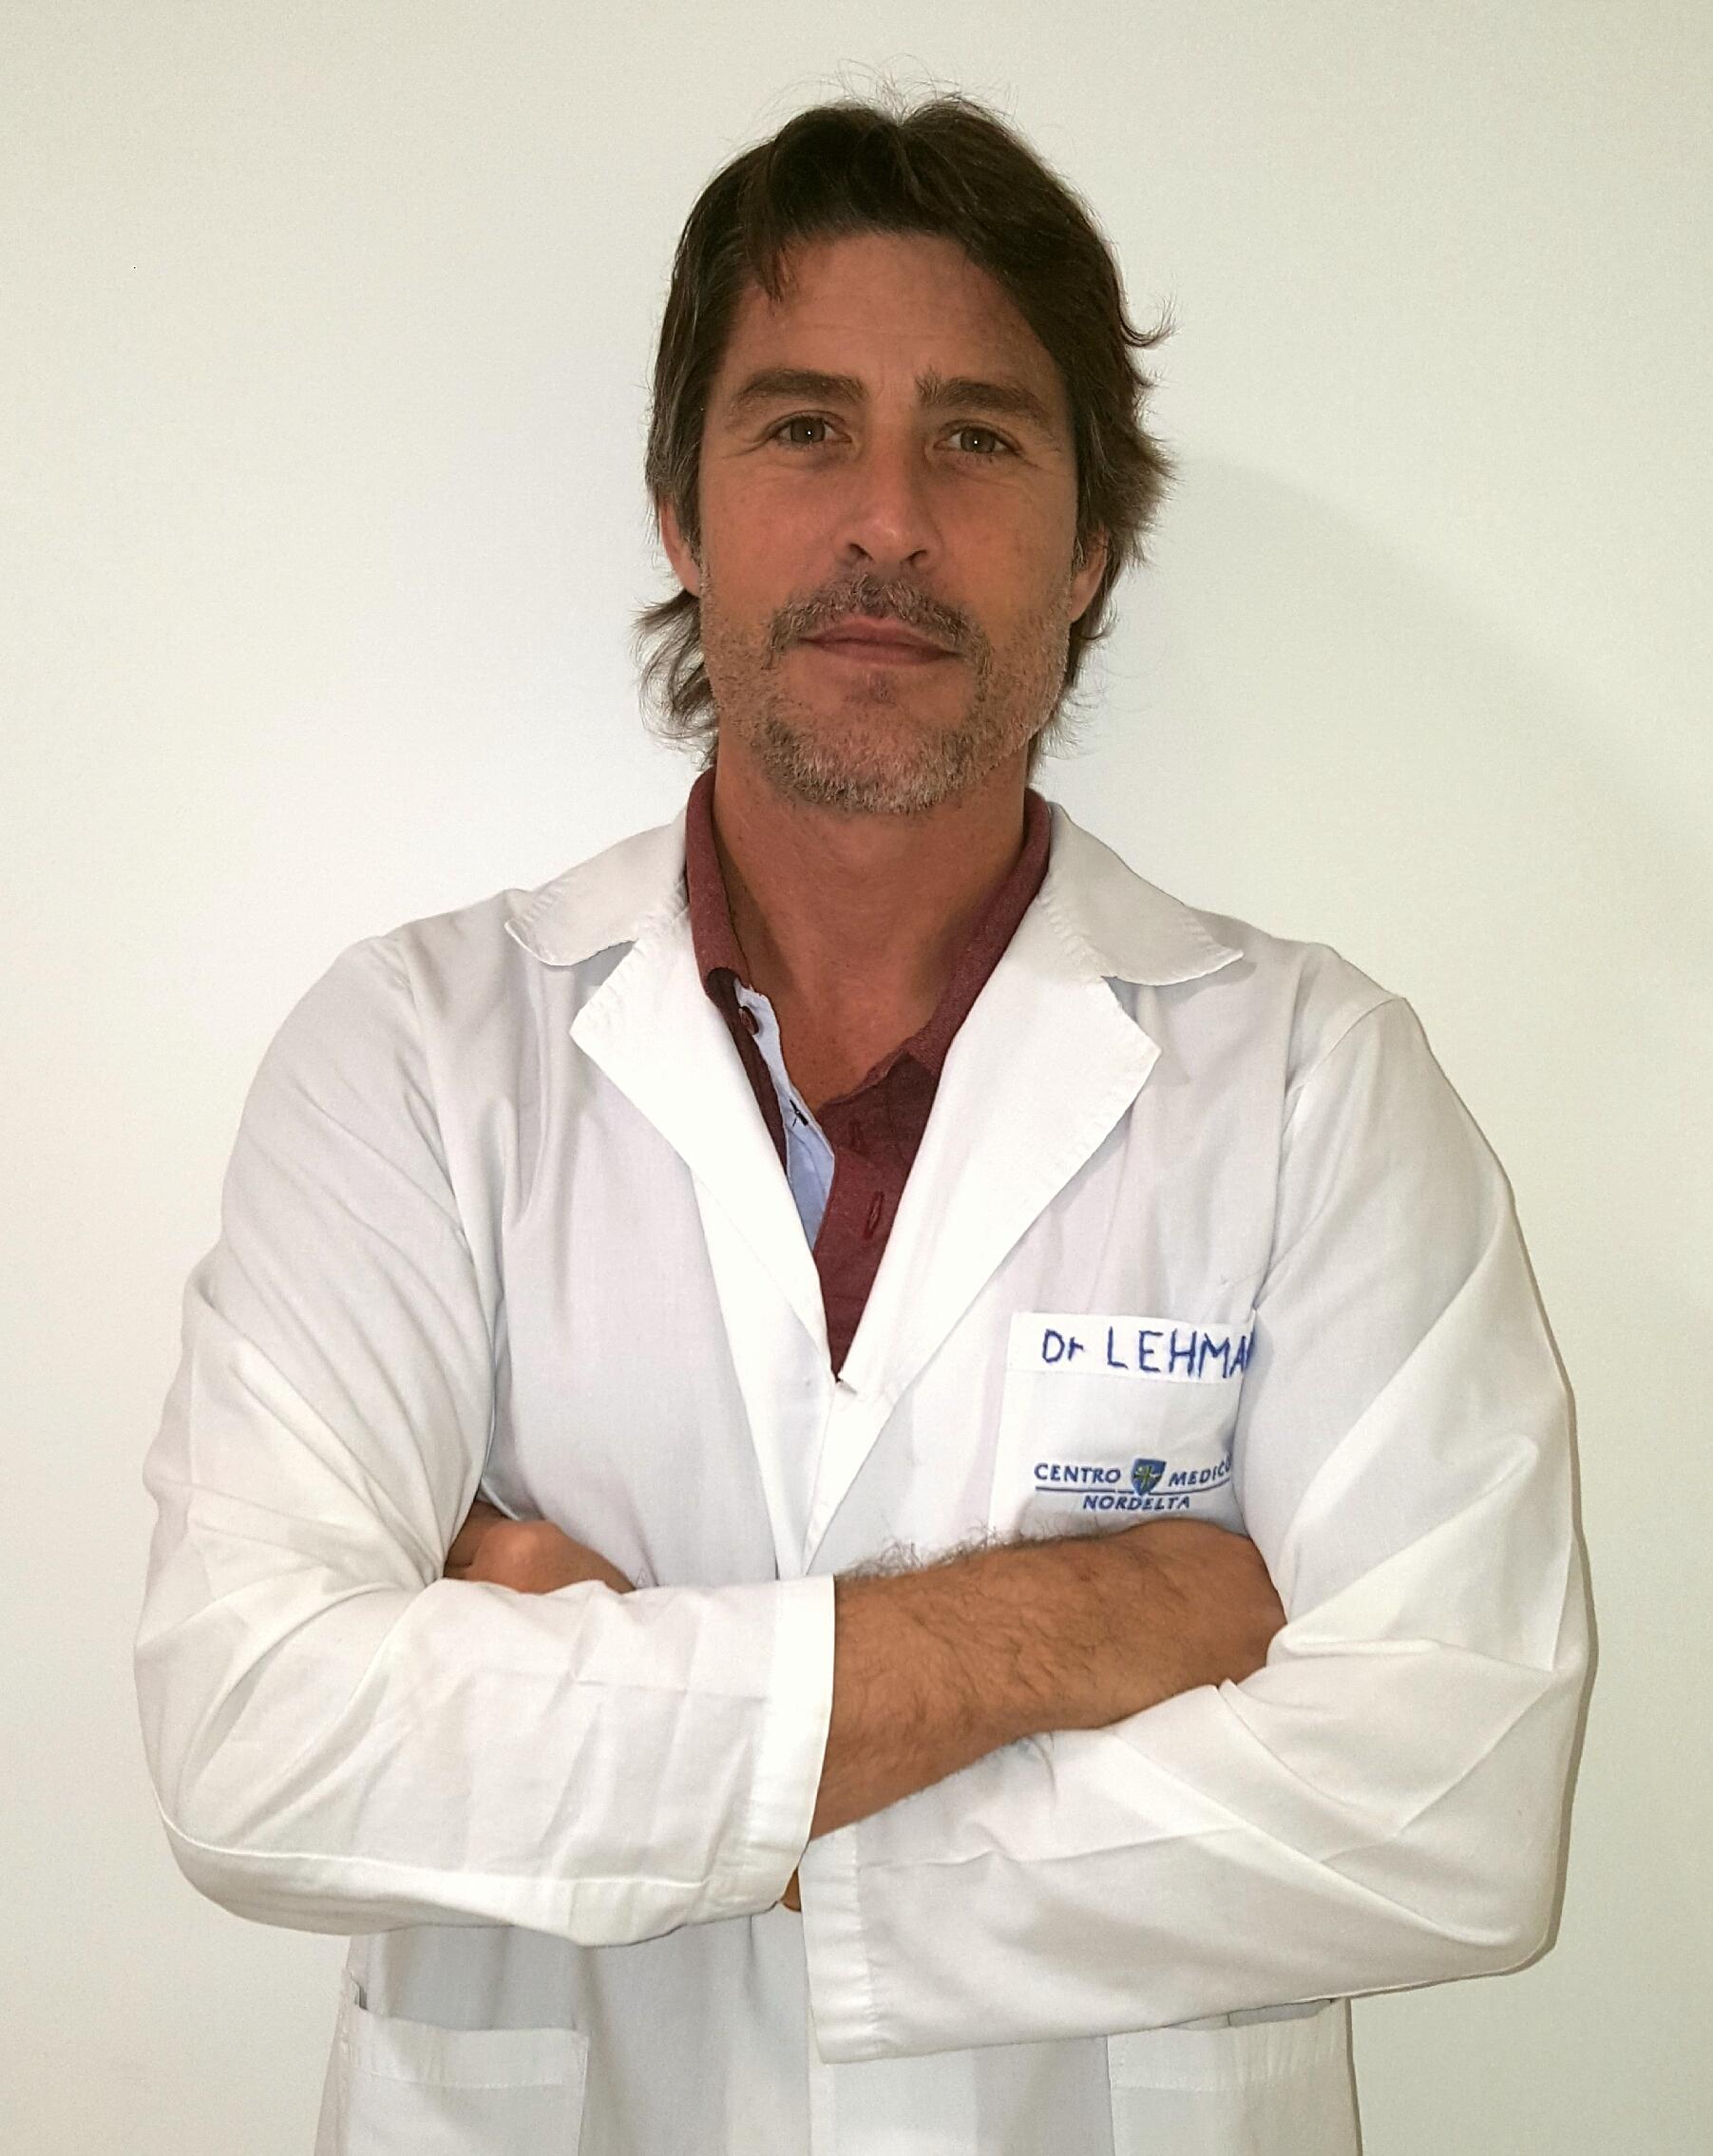 Dr. Lehmann Jose